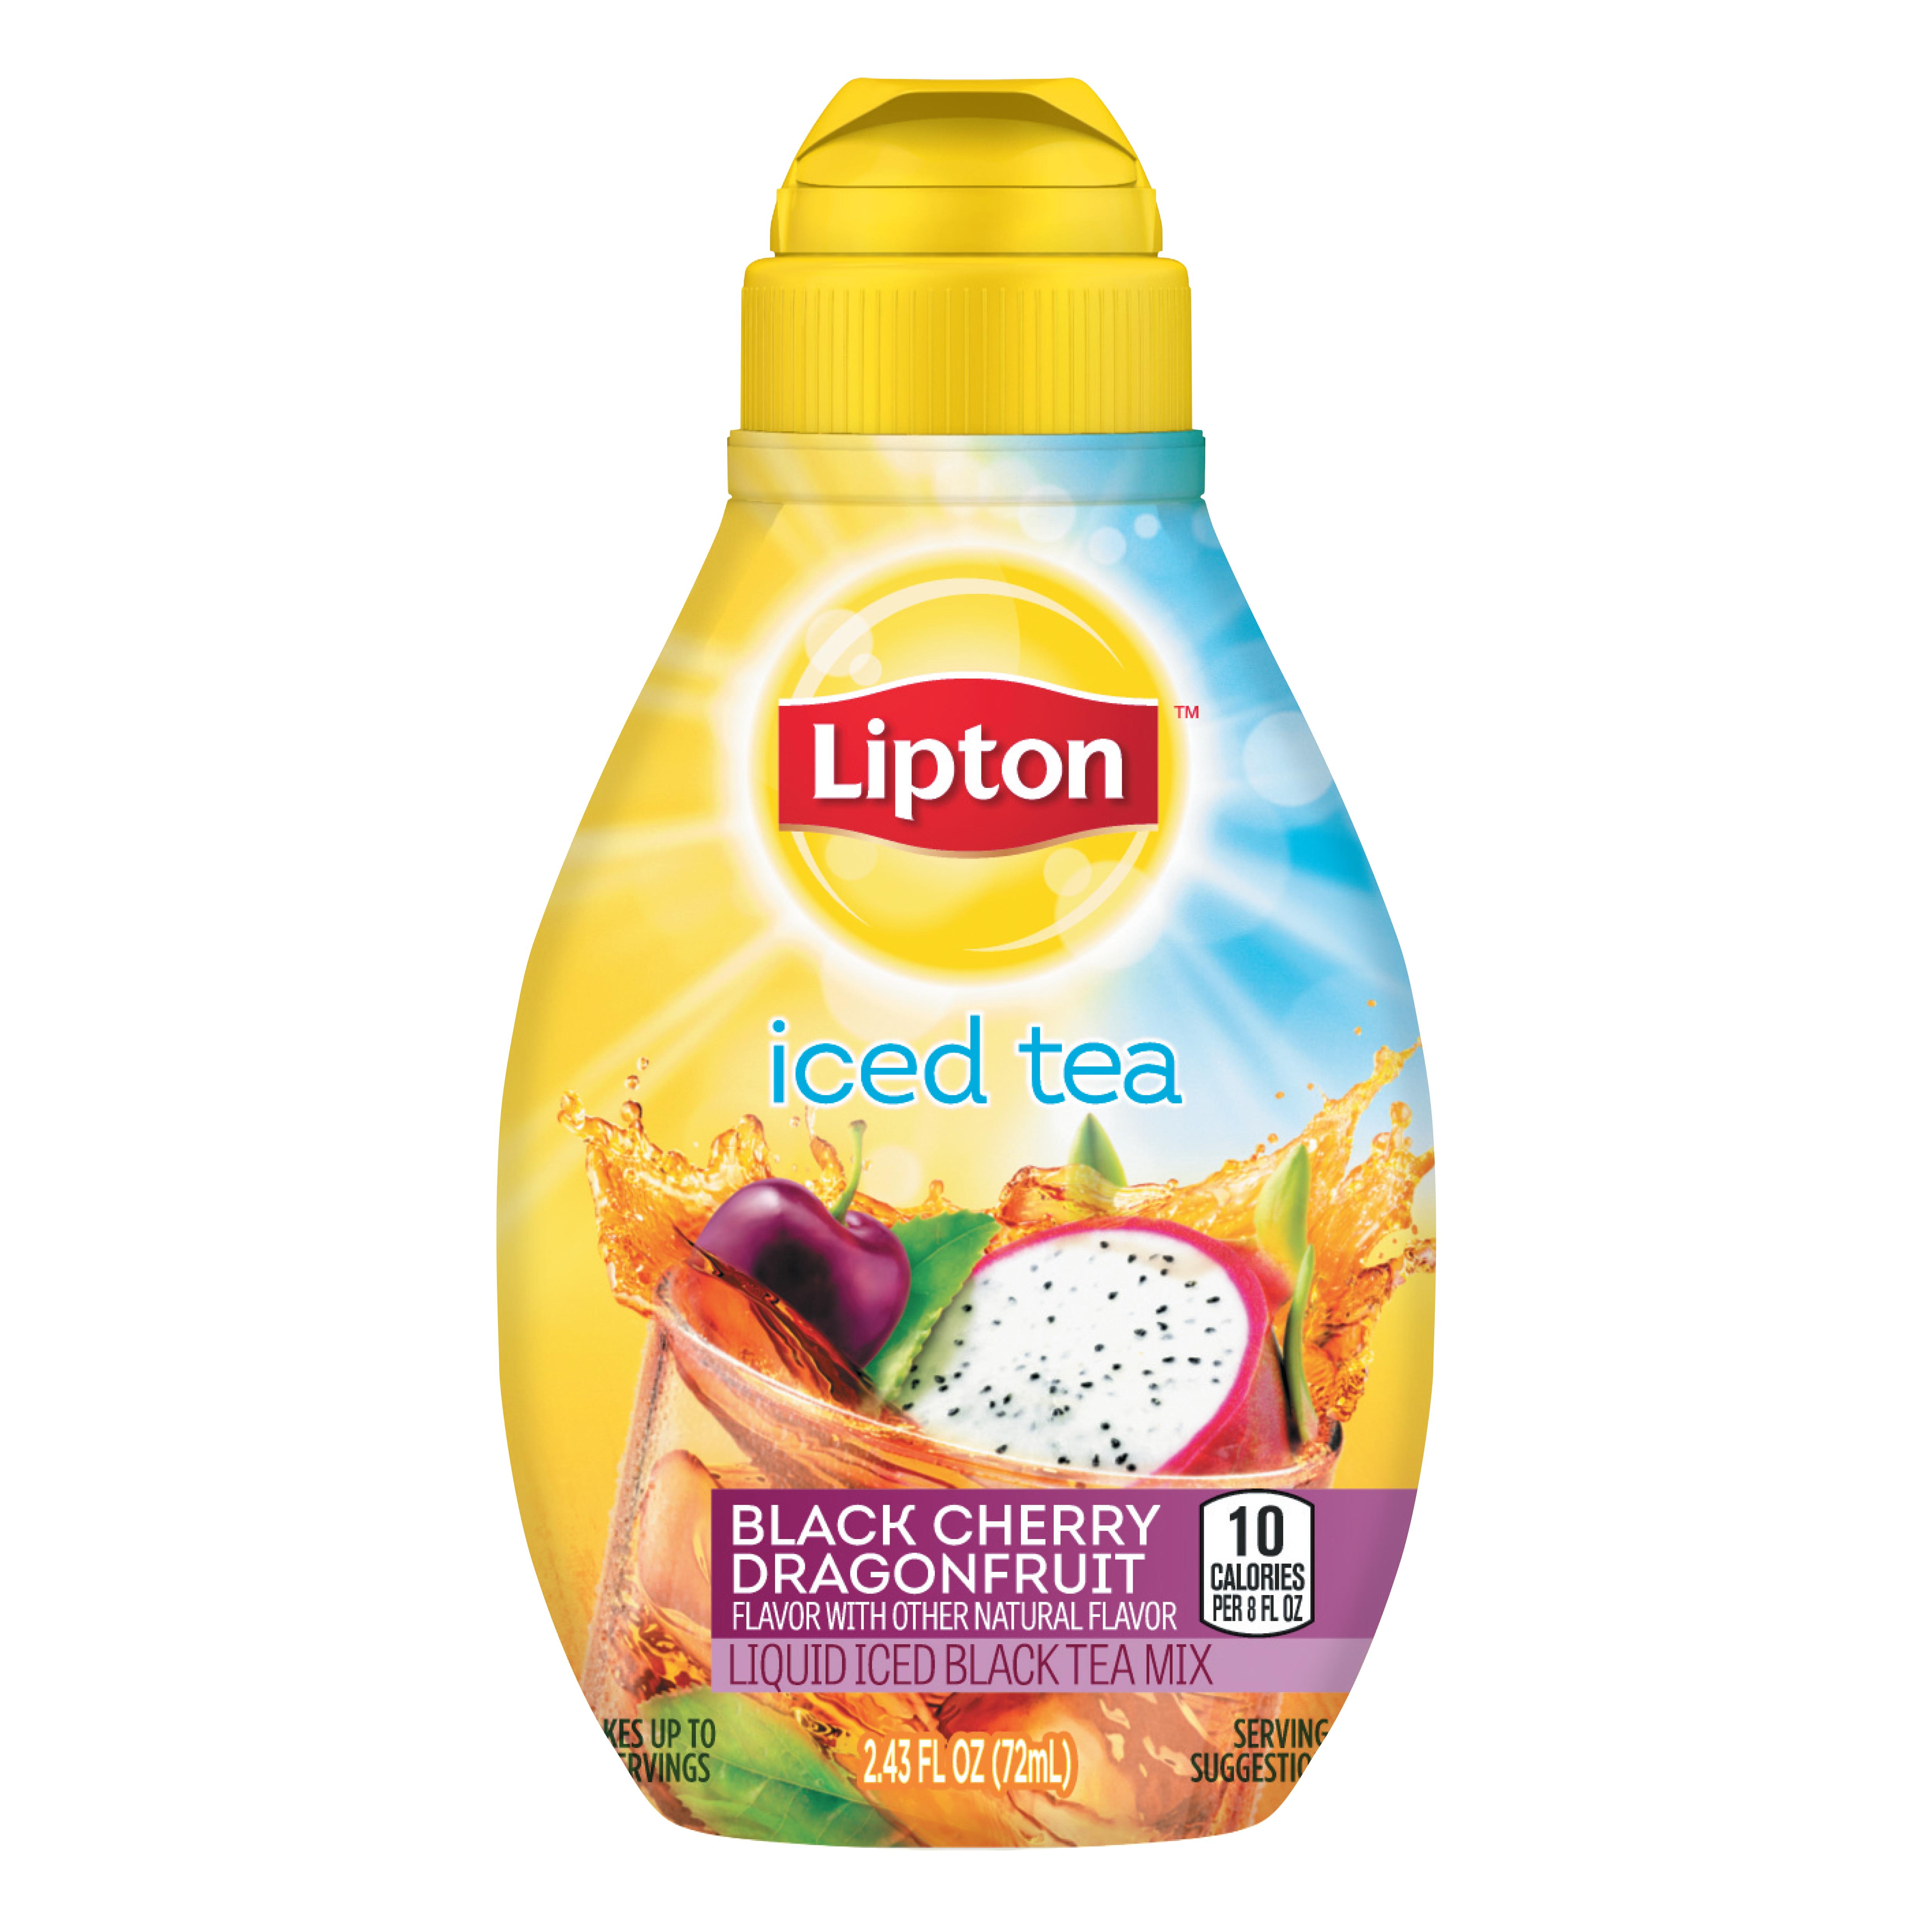 Black Cherry Dragonfruit Liquid Iced Tea Mix